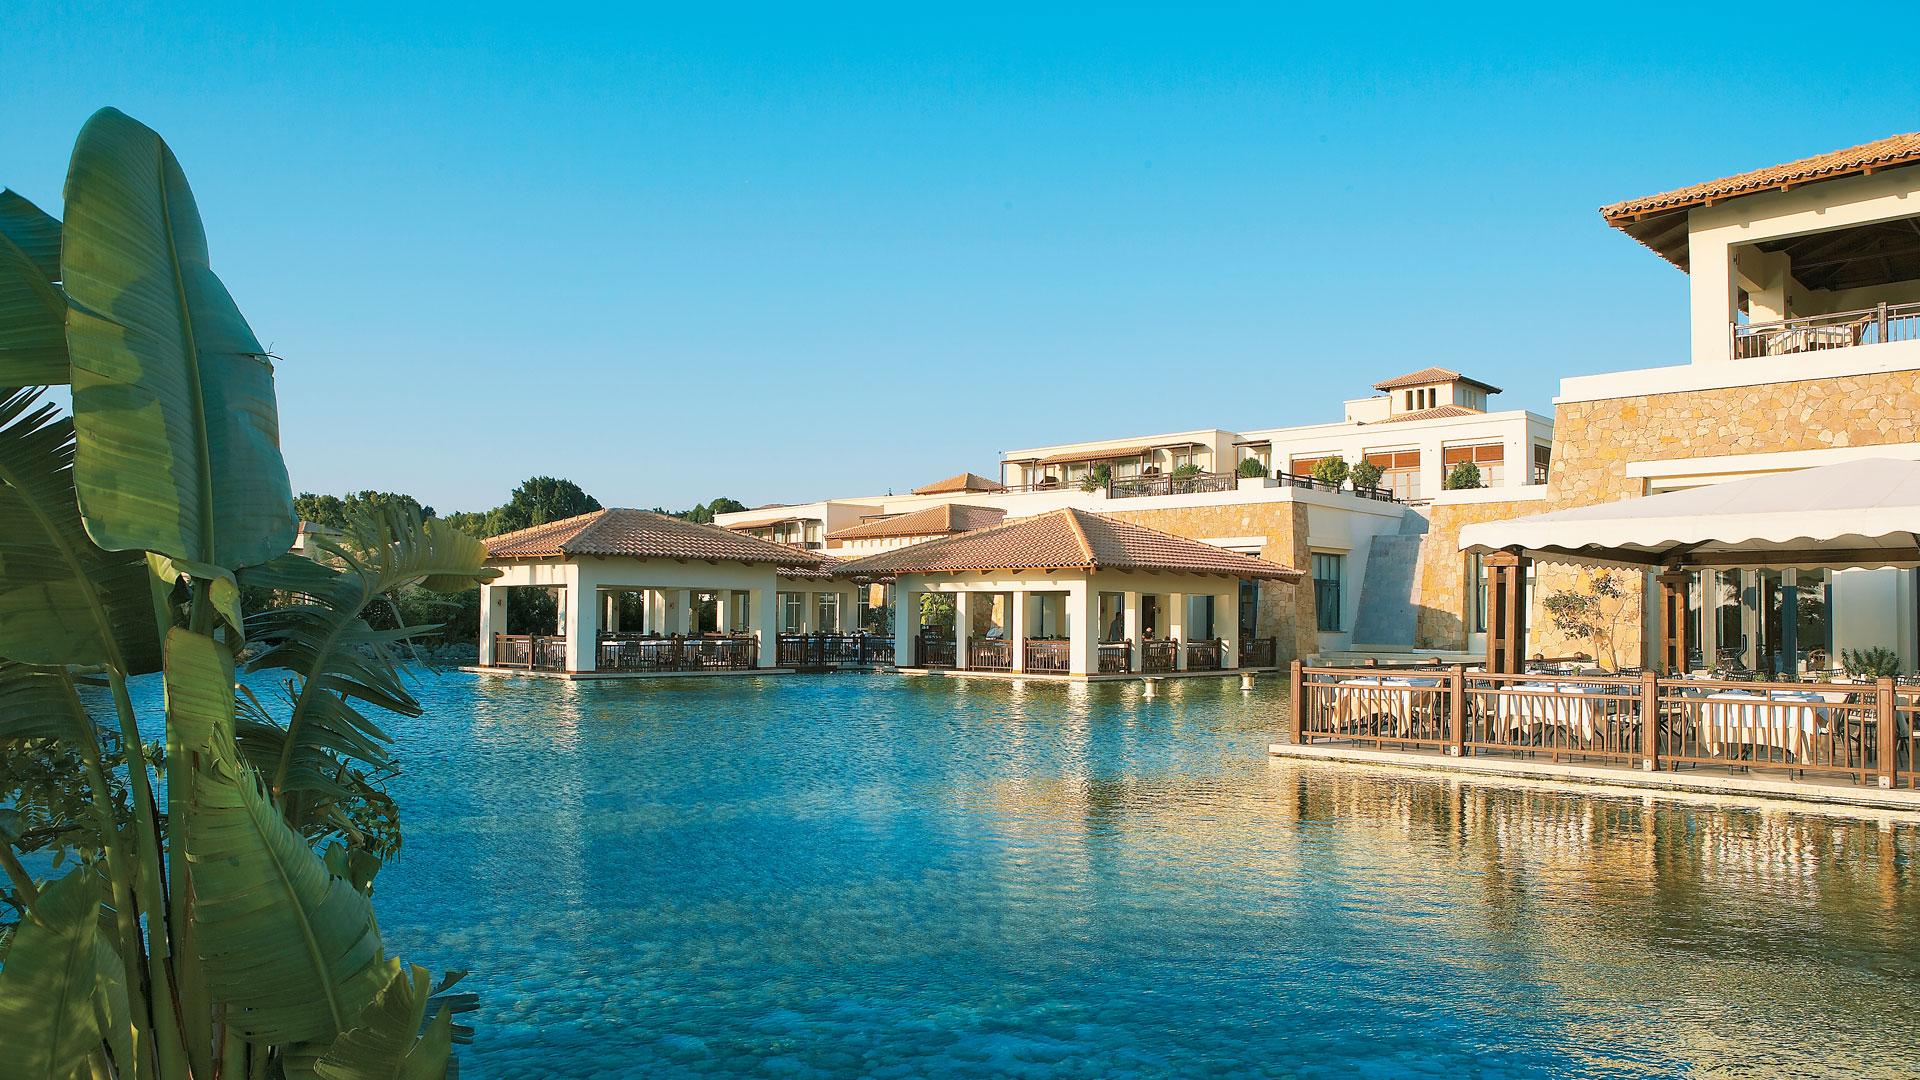 Kos Imperial Thalasso Luxury Hotel in Kos